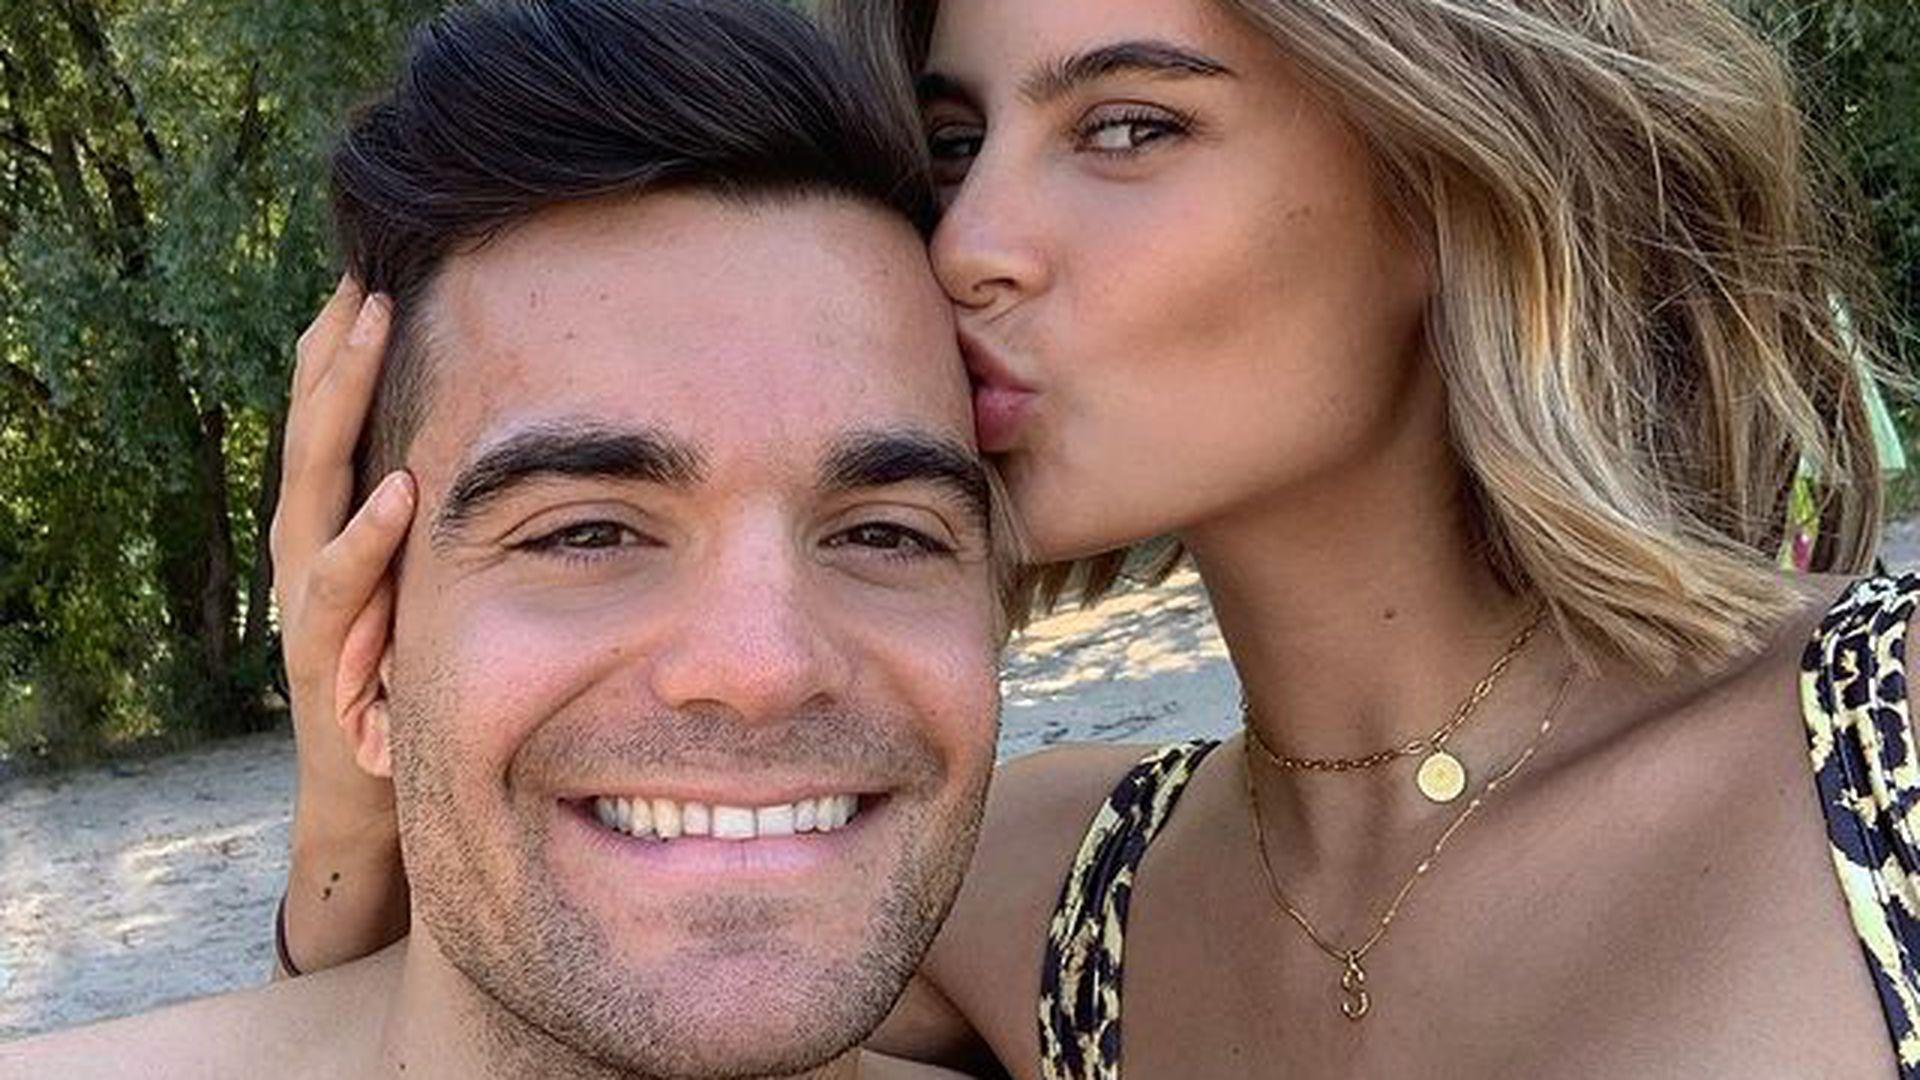 Total verliebt: GNTM-Romina will Kinder mit Stefano Zarrella - Promiflash.de